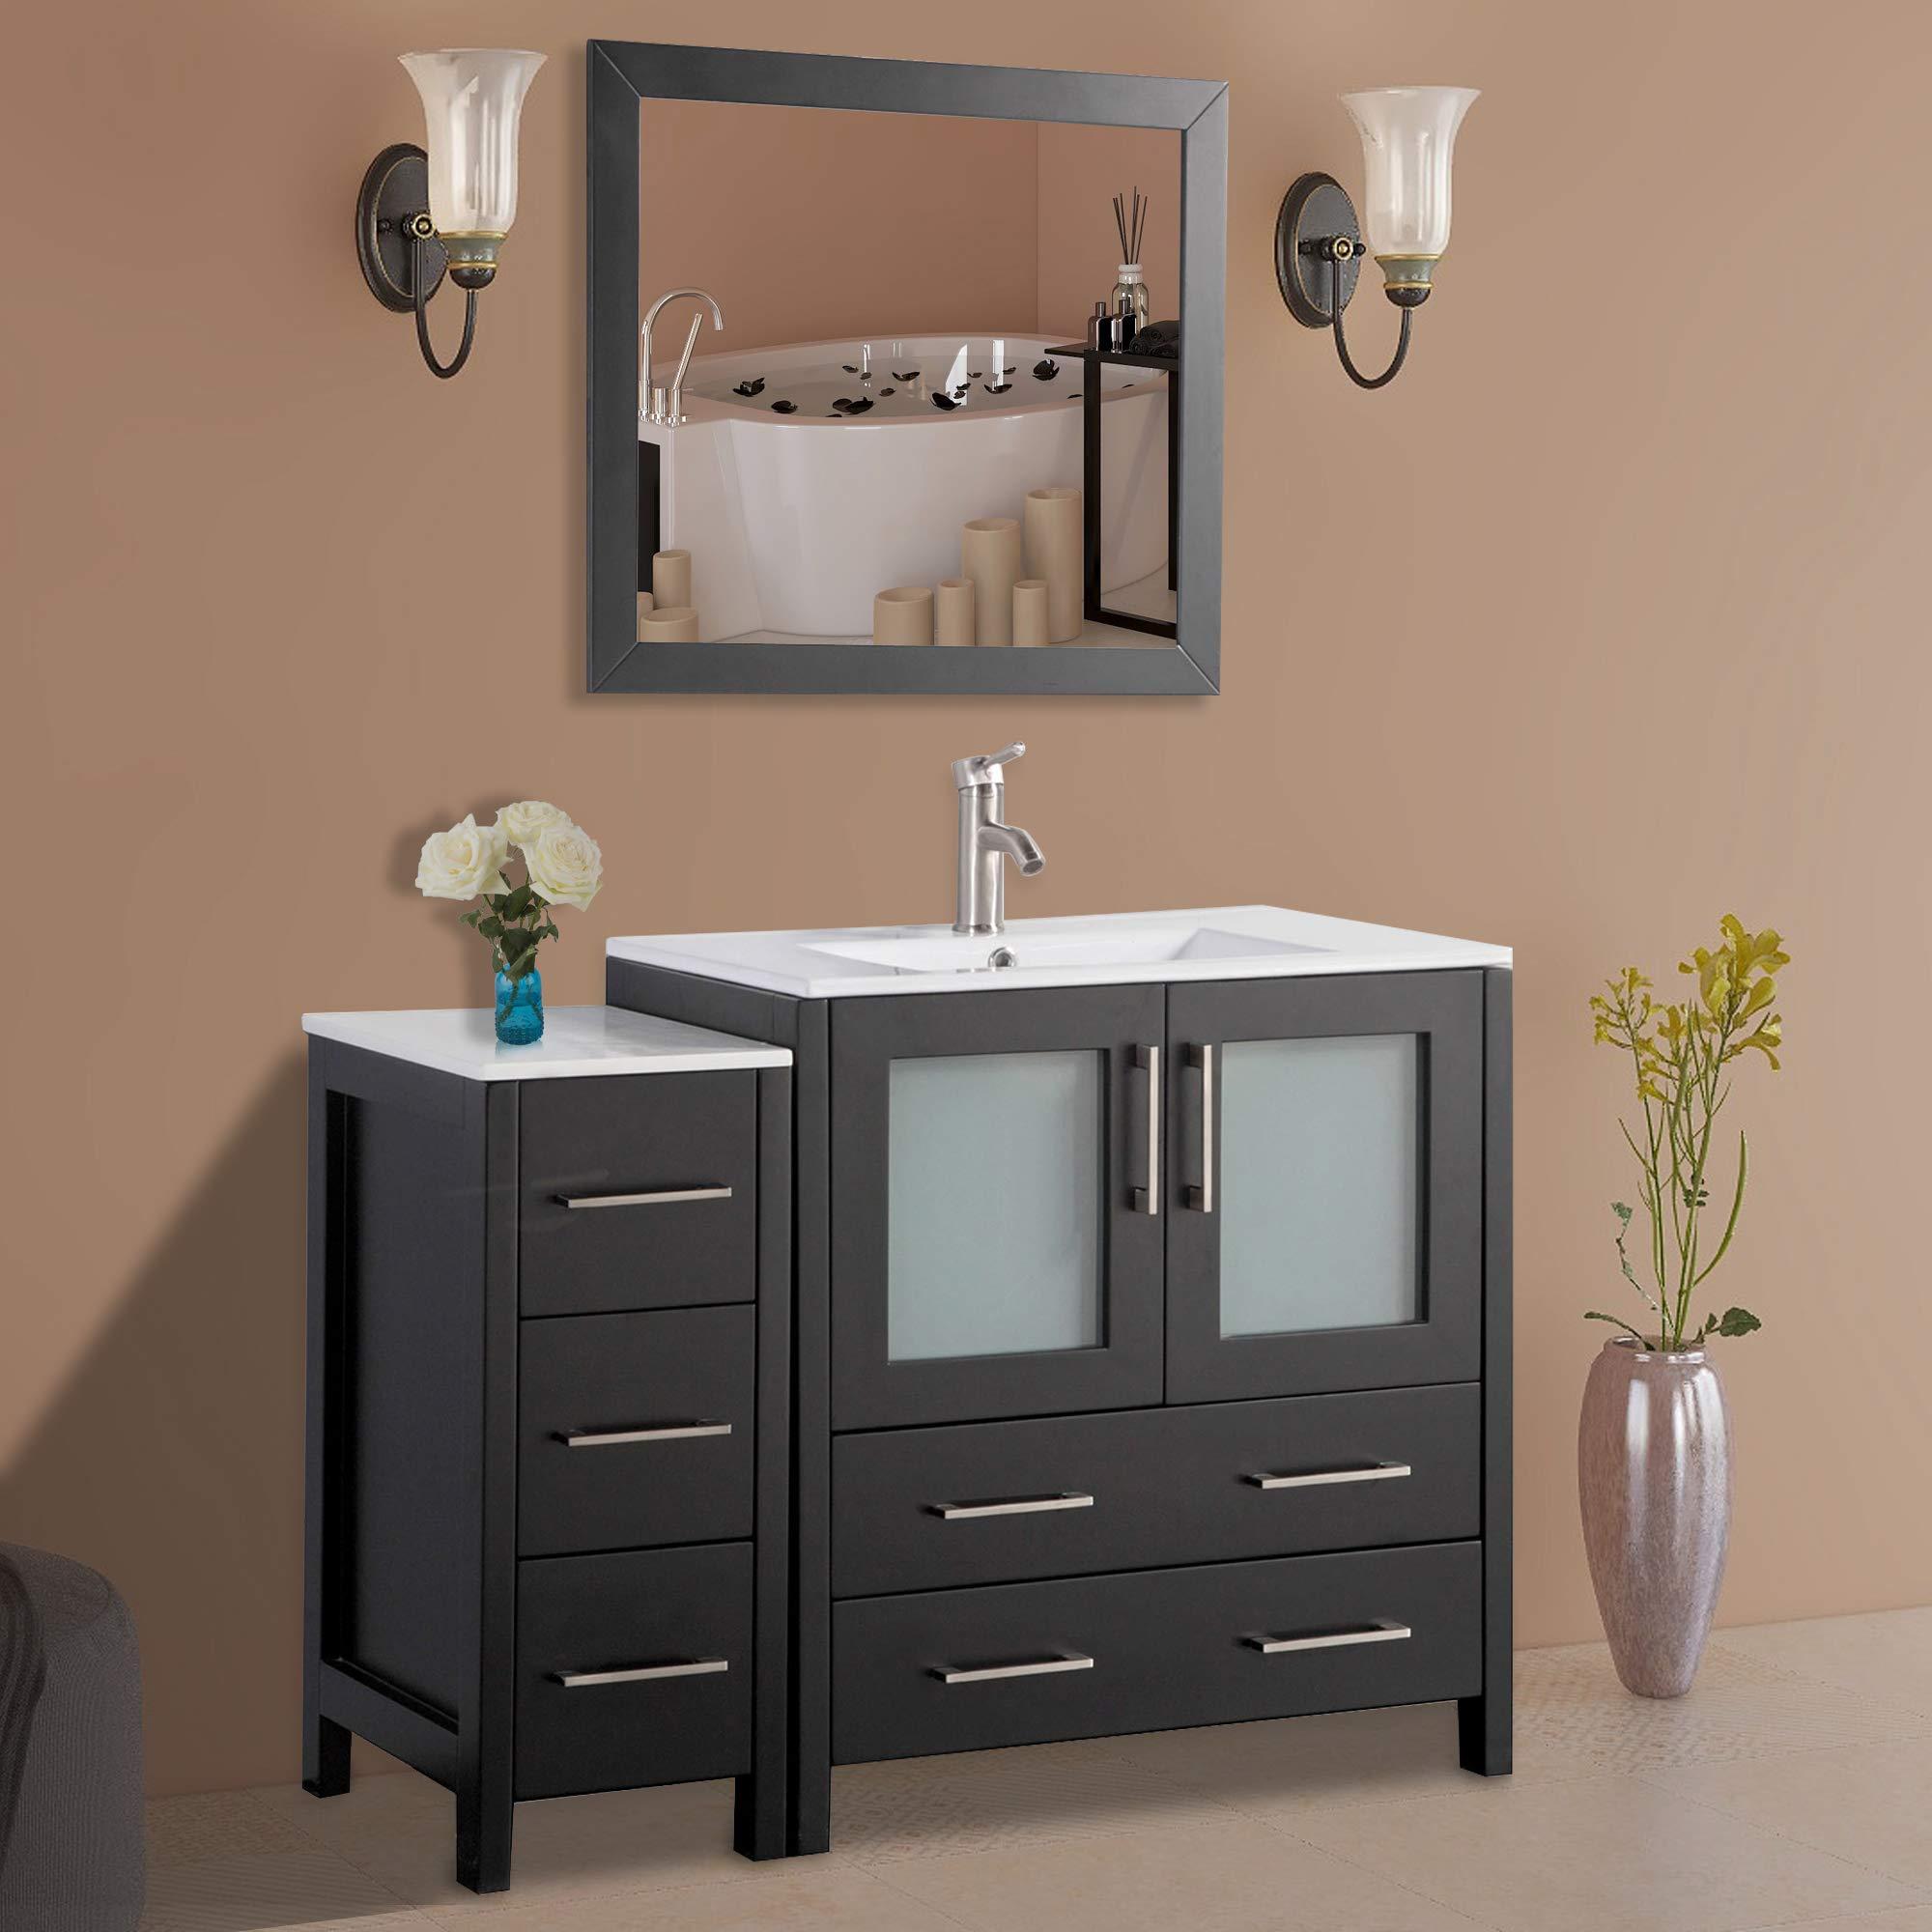 Vanity Art 42 Inch Single Sink Modern Bathroom Vanity Combo Set 1 Shelf 5 Drawers Ceramic Top Bathroom Cabinet With Free Mirror Va3030 42 E Buy Online In China At China Desertcart Com Productid 199676053